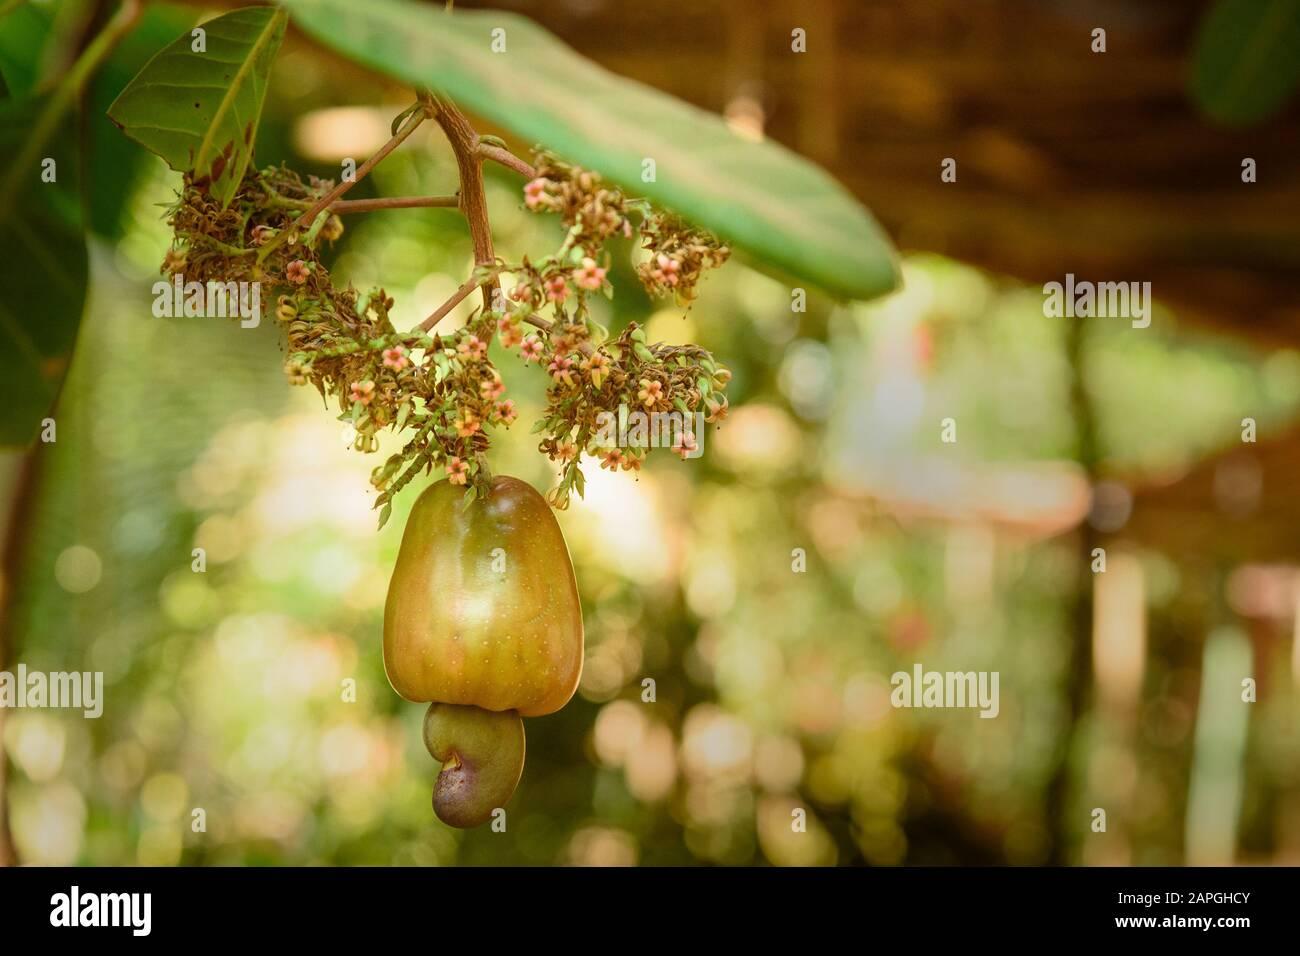 Cashew Nuts Or Anacardium Occidentale Grow On Tree Branch In Gokarna India Stock Photo Alamy